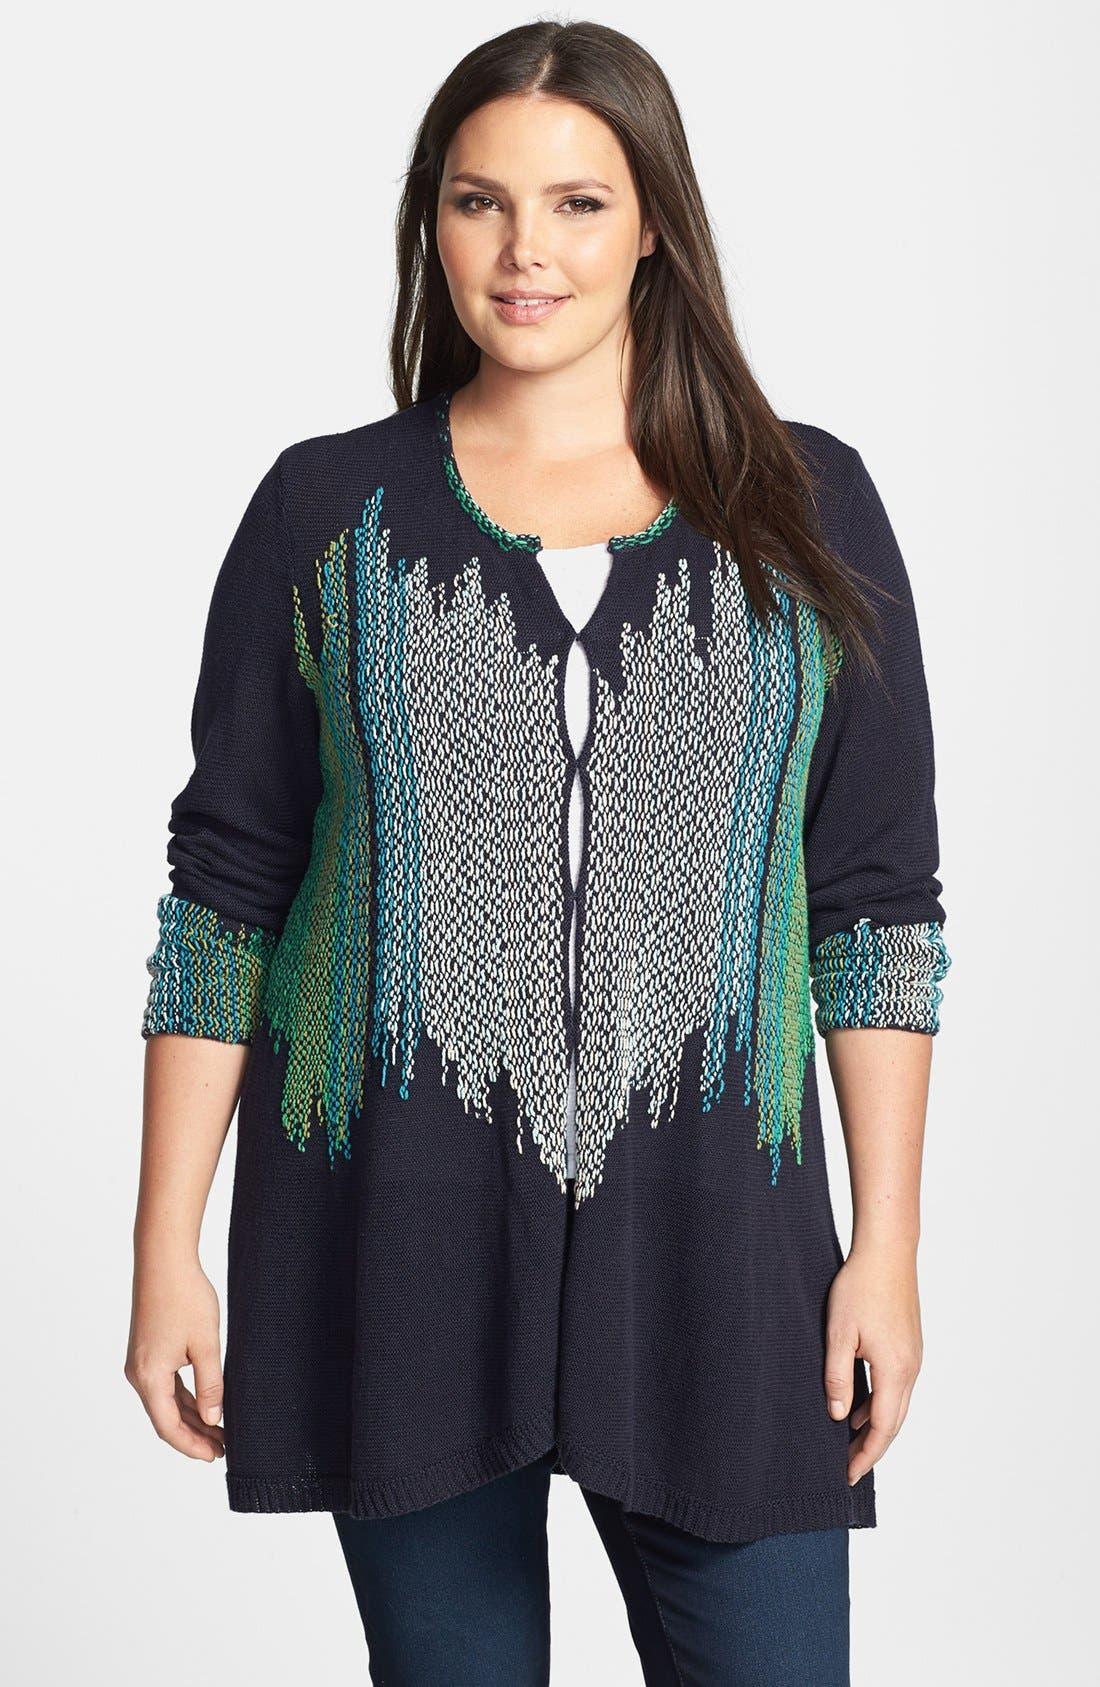 Alternate Image 1 Selected - NIC+ZOE 'Color Weave' Cardigan (Plus Size)